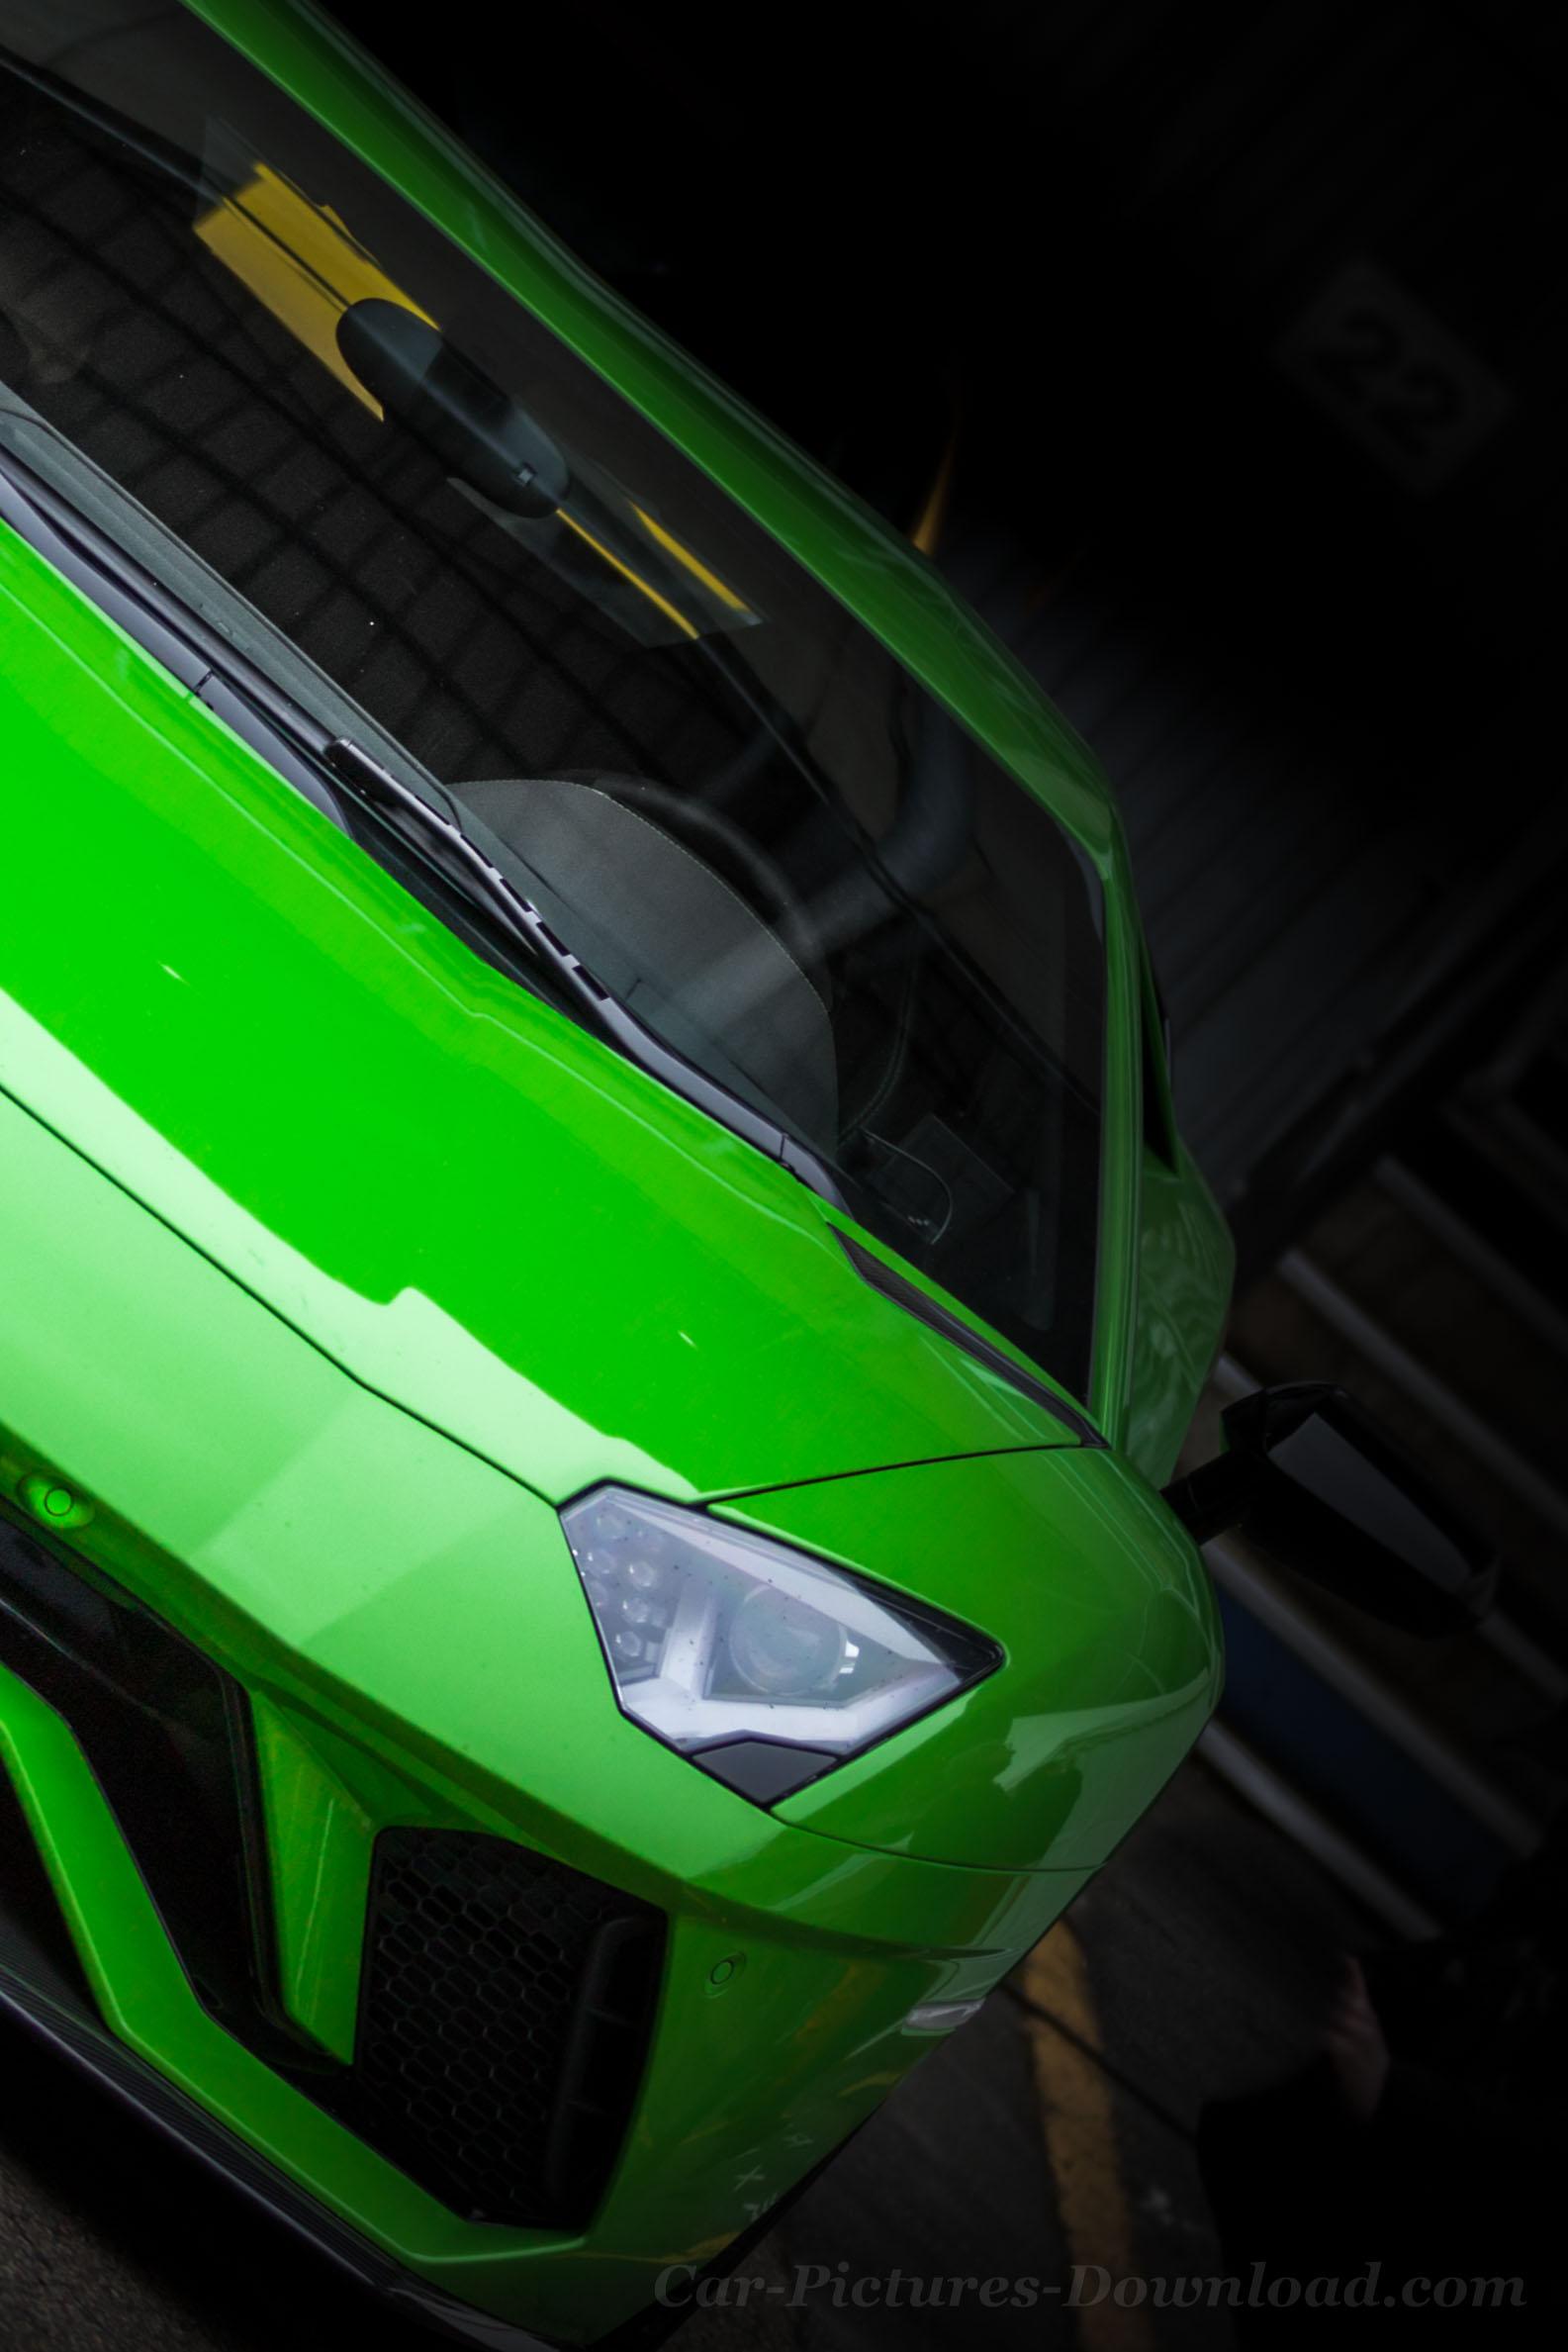 Lamborghini Aventador Phone Wallpaper - Phone Wallpapers Hd , HD Wallpaper & Backgrounds